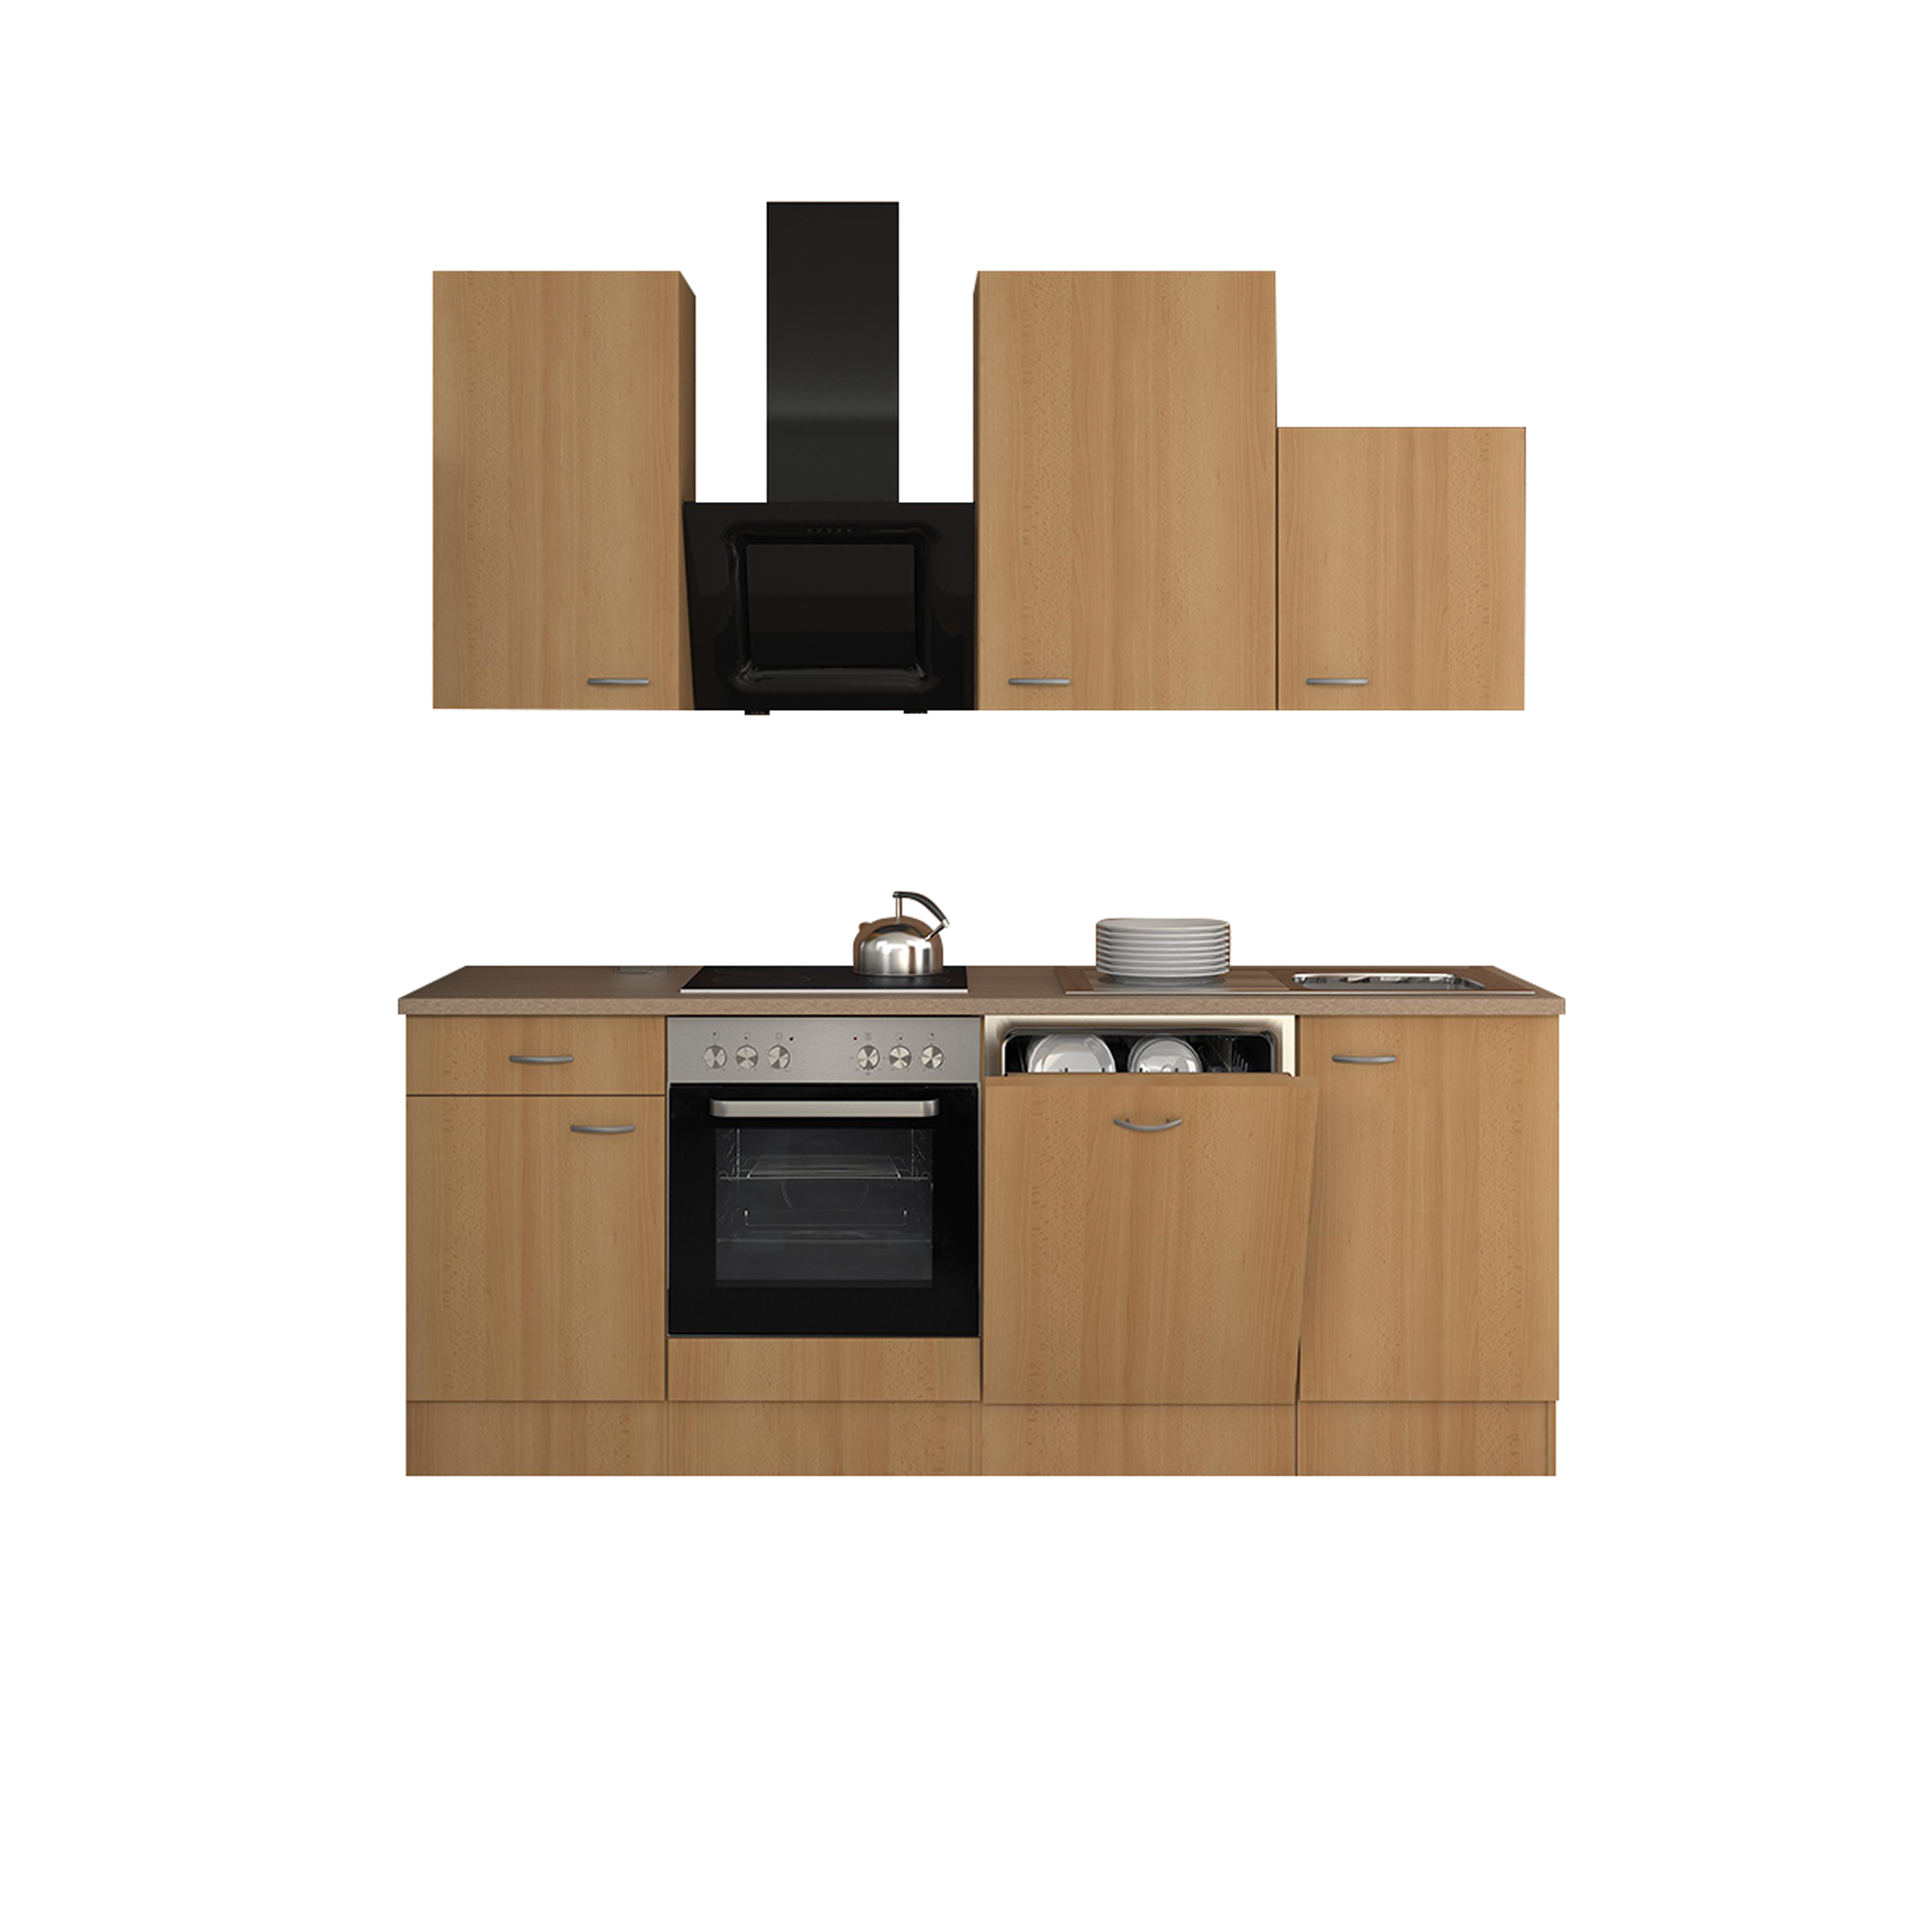 k chenzeile nano k che mit design abzugshaube breite 220 cm buche k che k chenzeilen. Black Bedroom Furniture Sets. Home Design Ideas